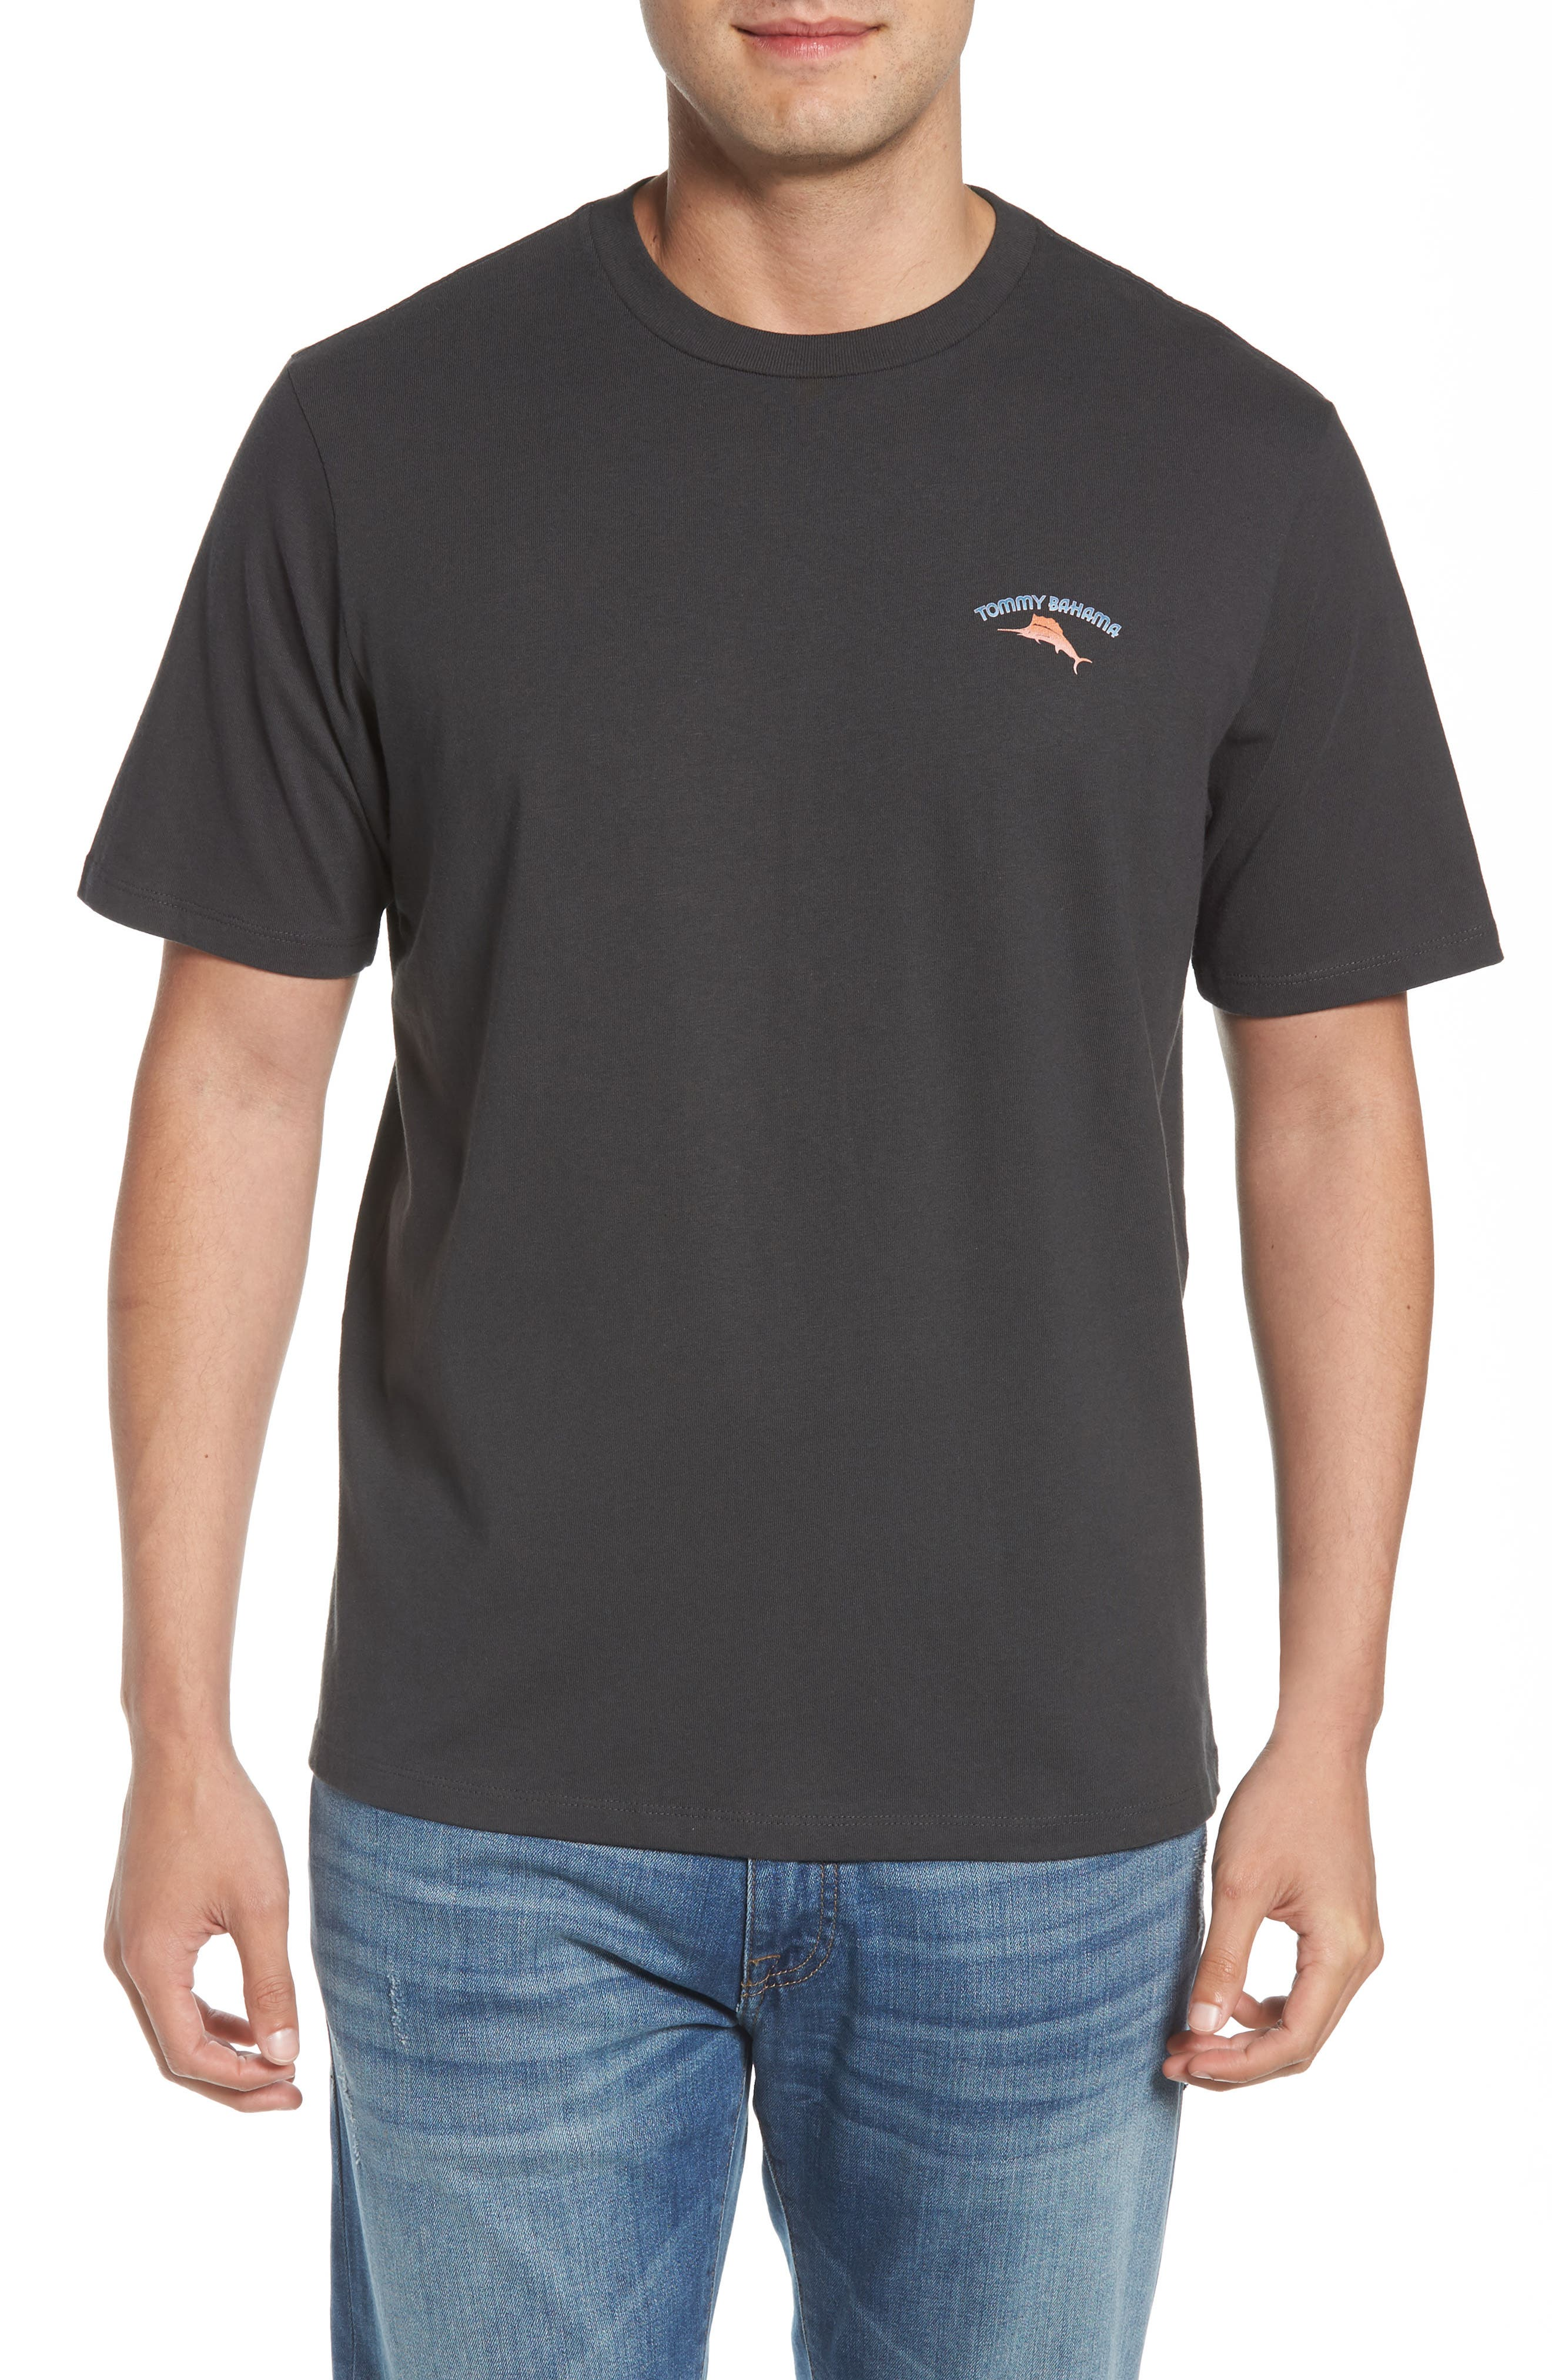 Bromingos T-Shirt,                             Main thumbnail 1, color,                             Coal